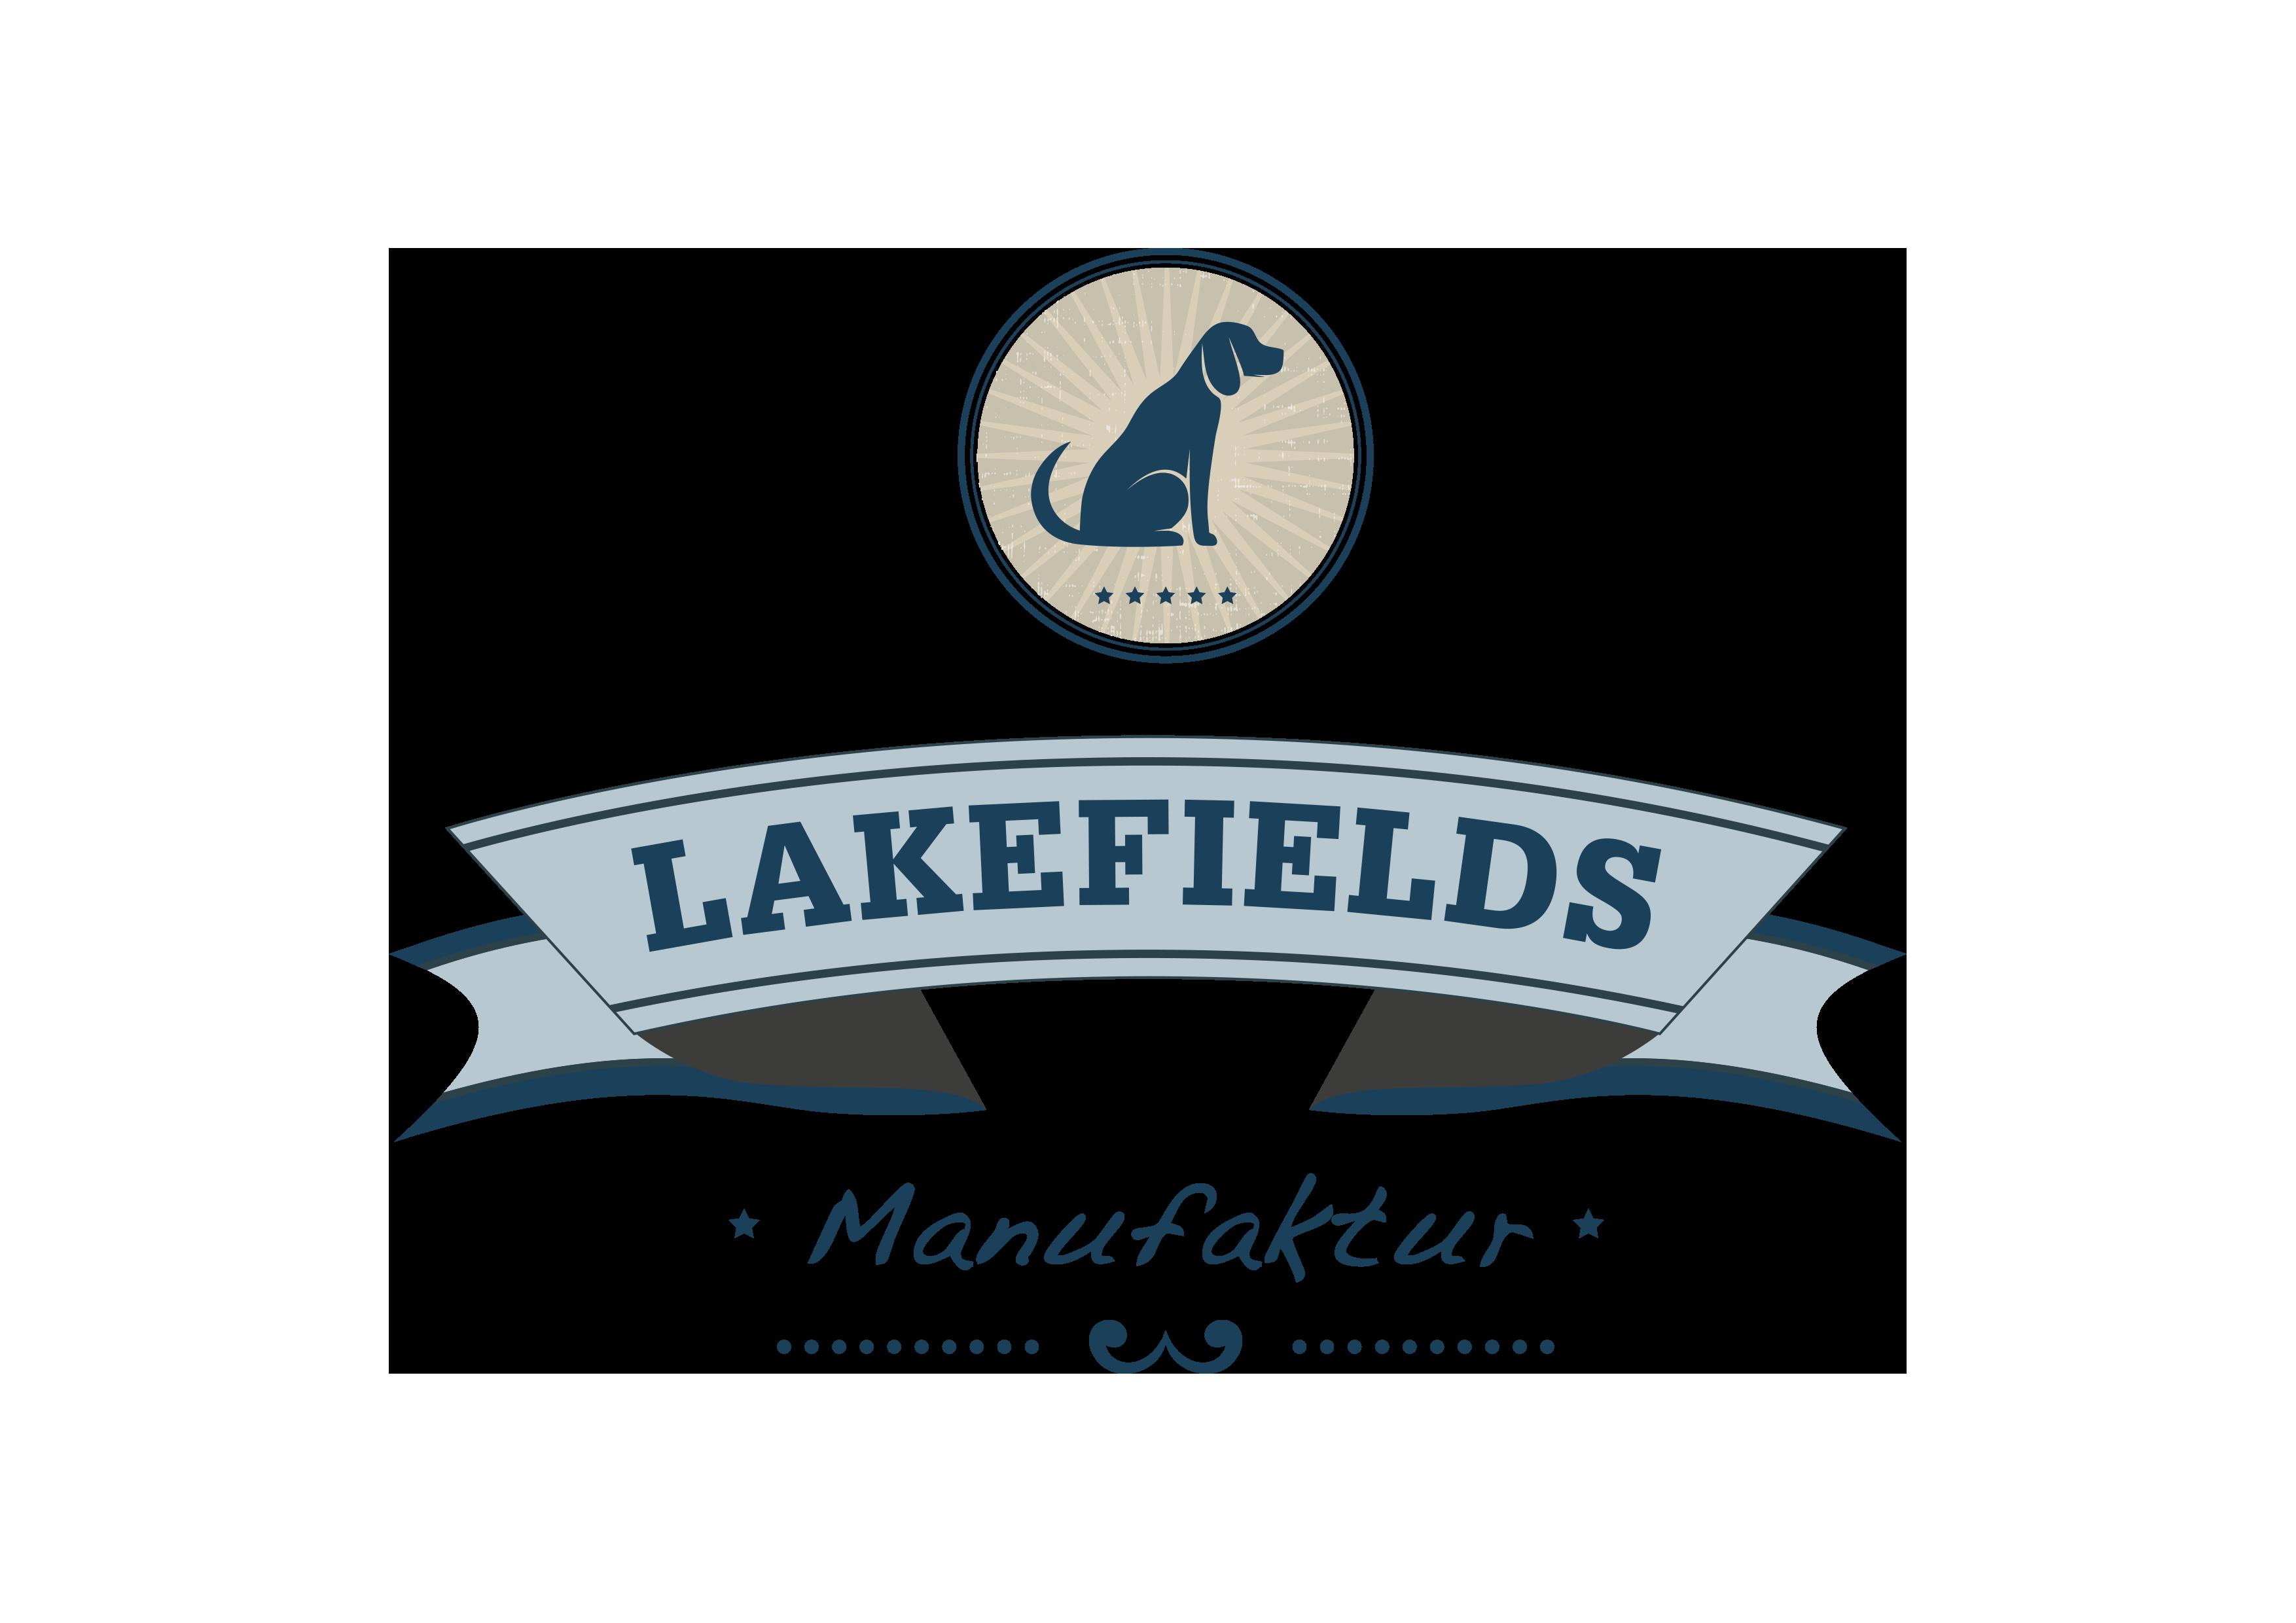 LAKEFIELDS